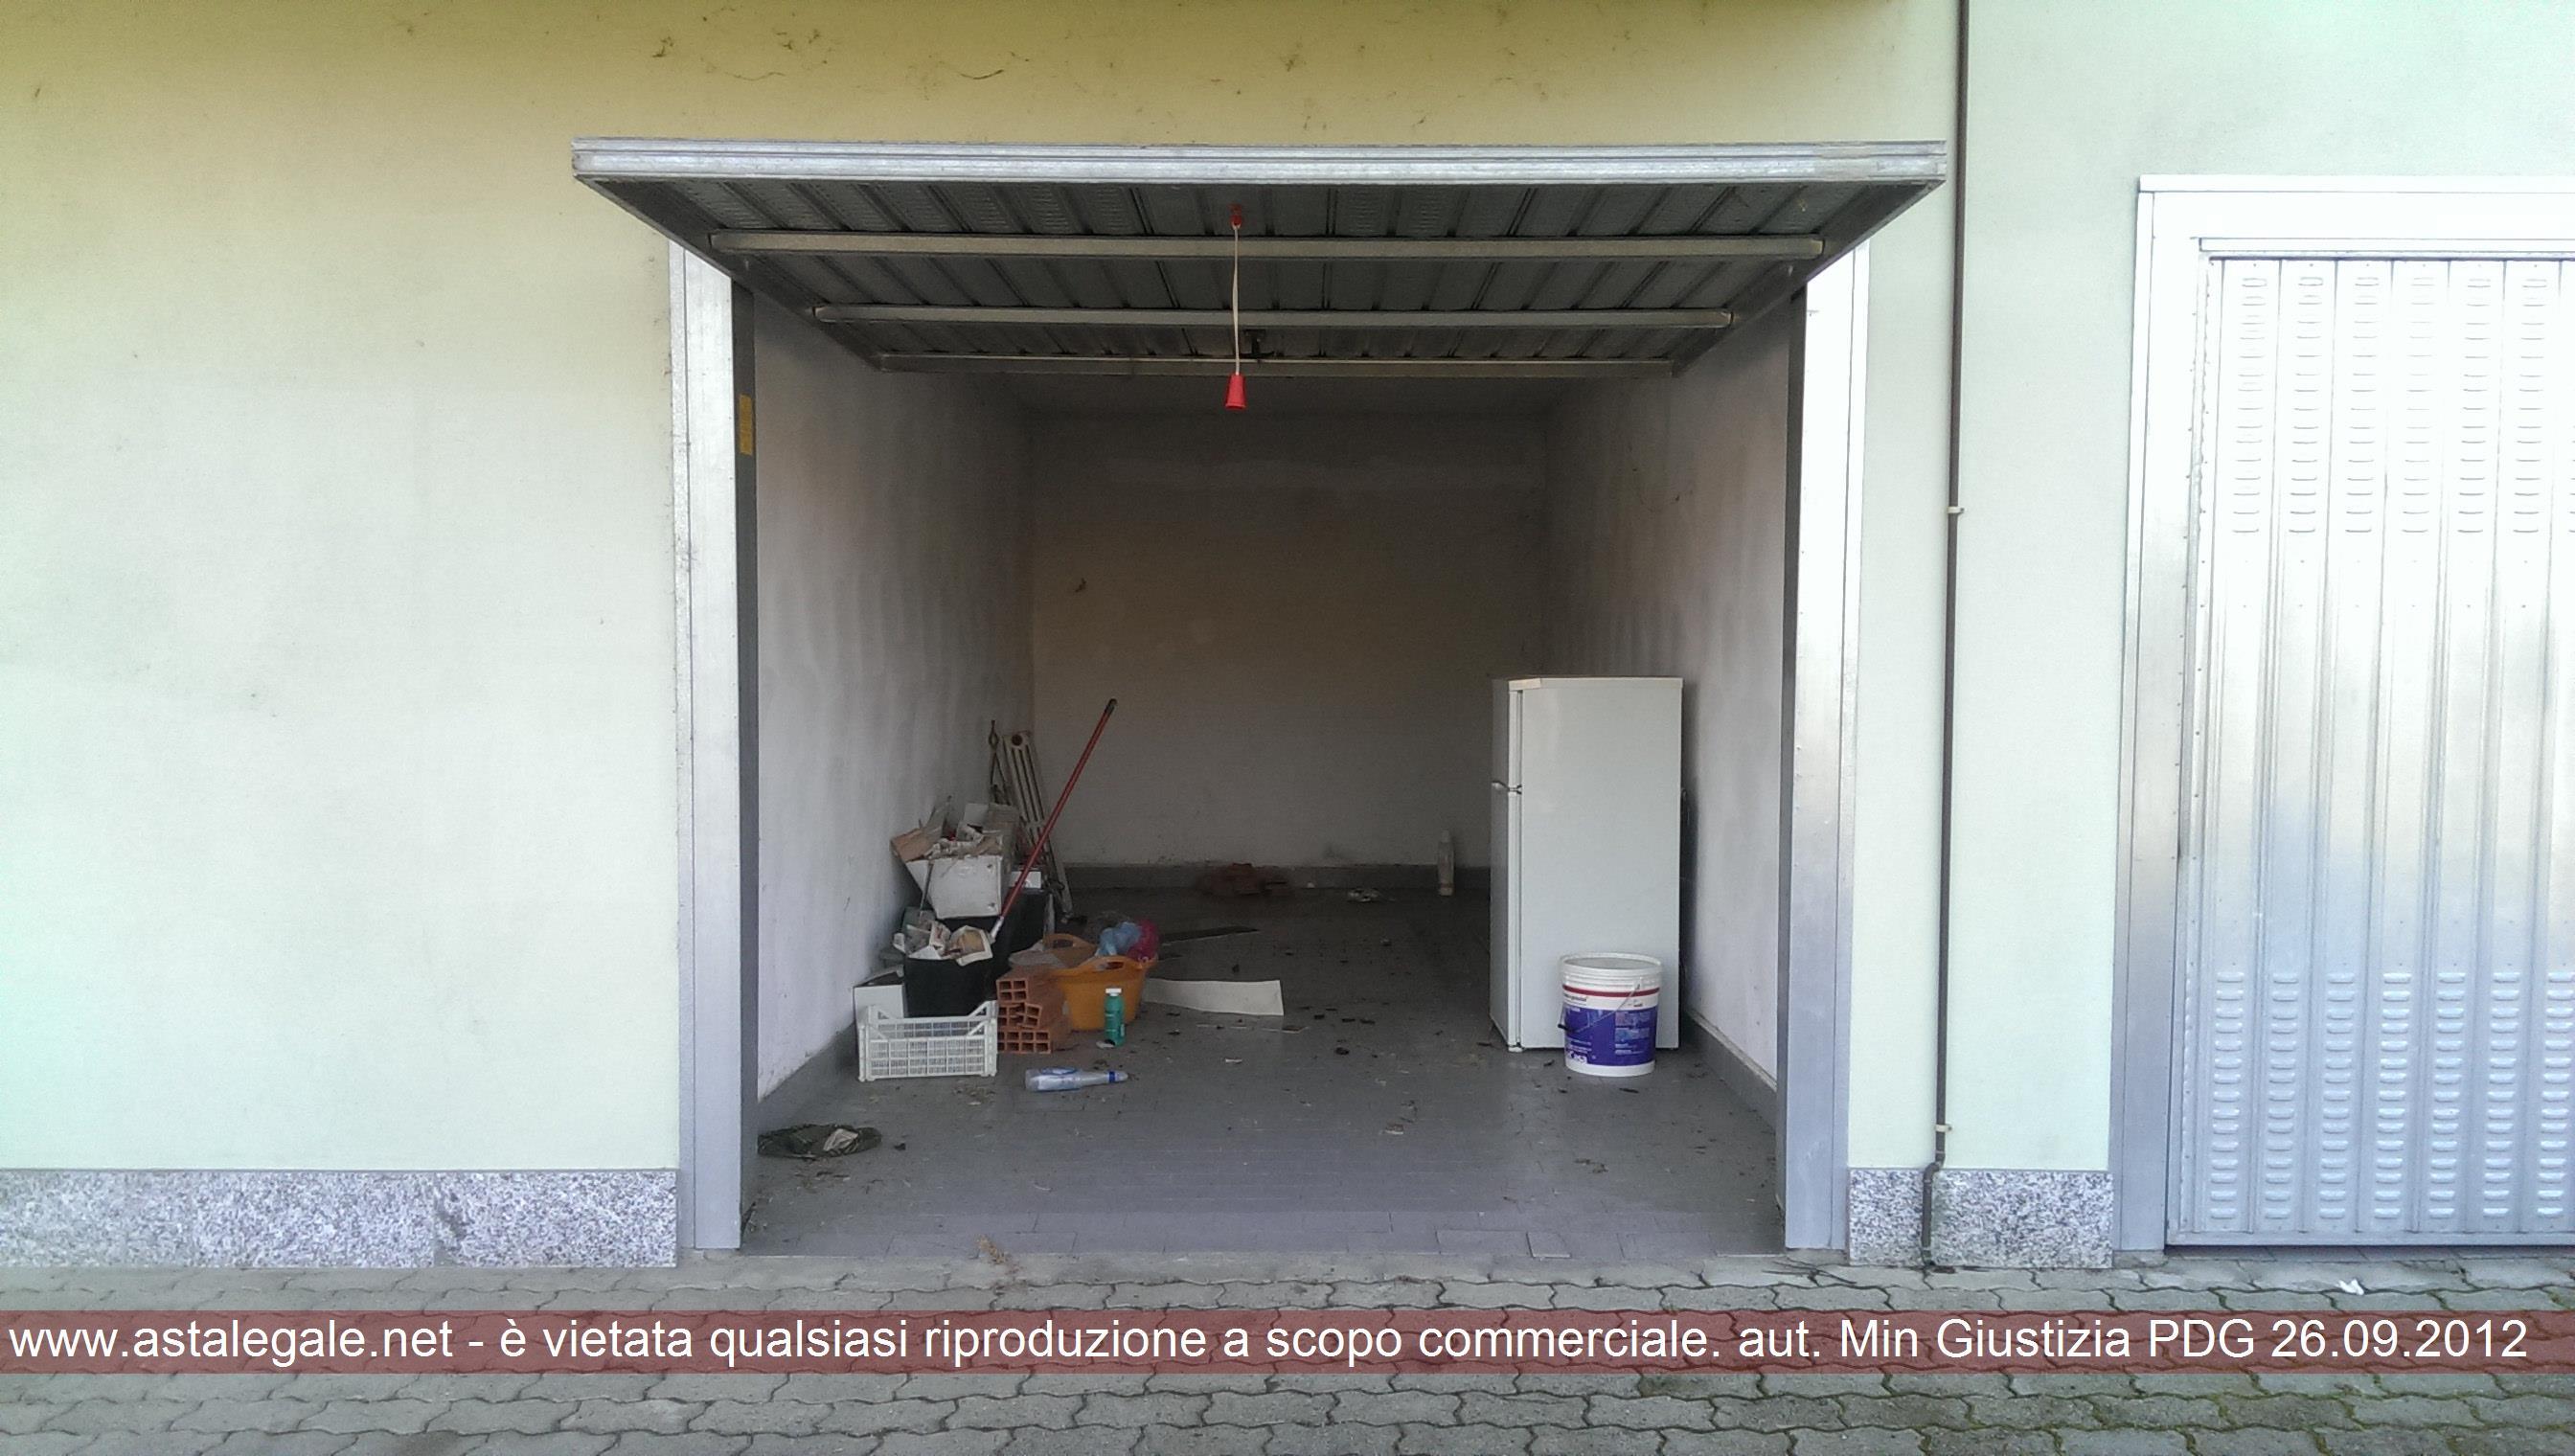 Chignolo Po (PV) Via Umberto Terracini snc